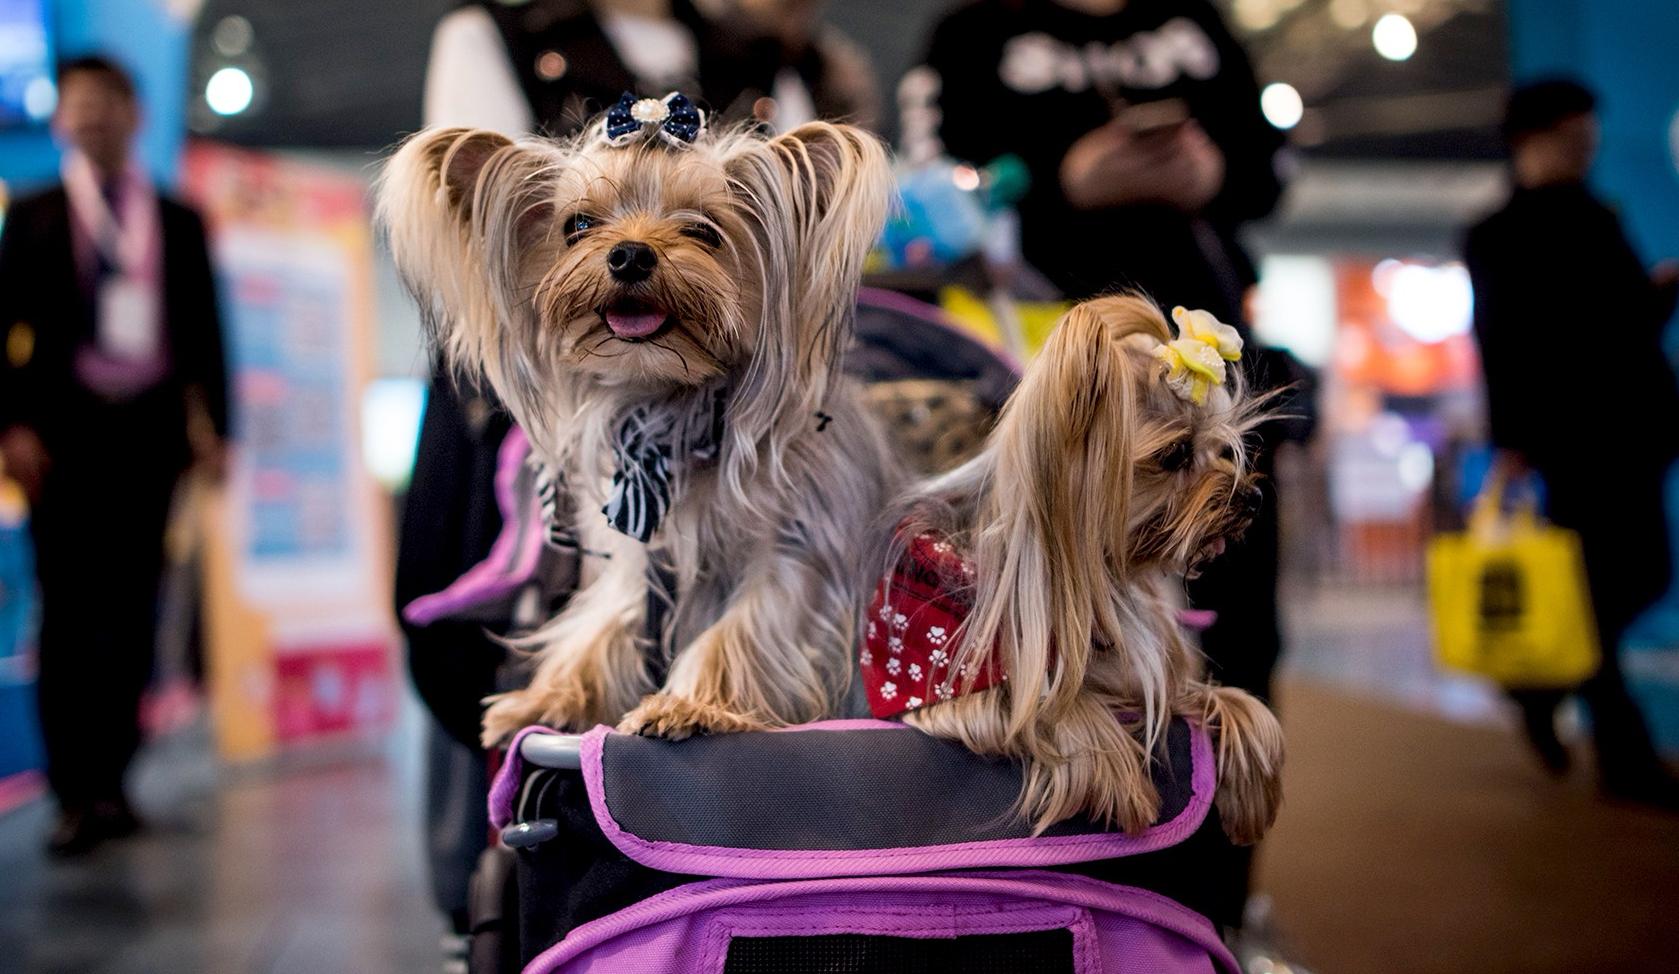 unleashed-dog-strollers.jpg